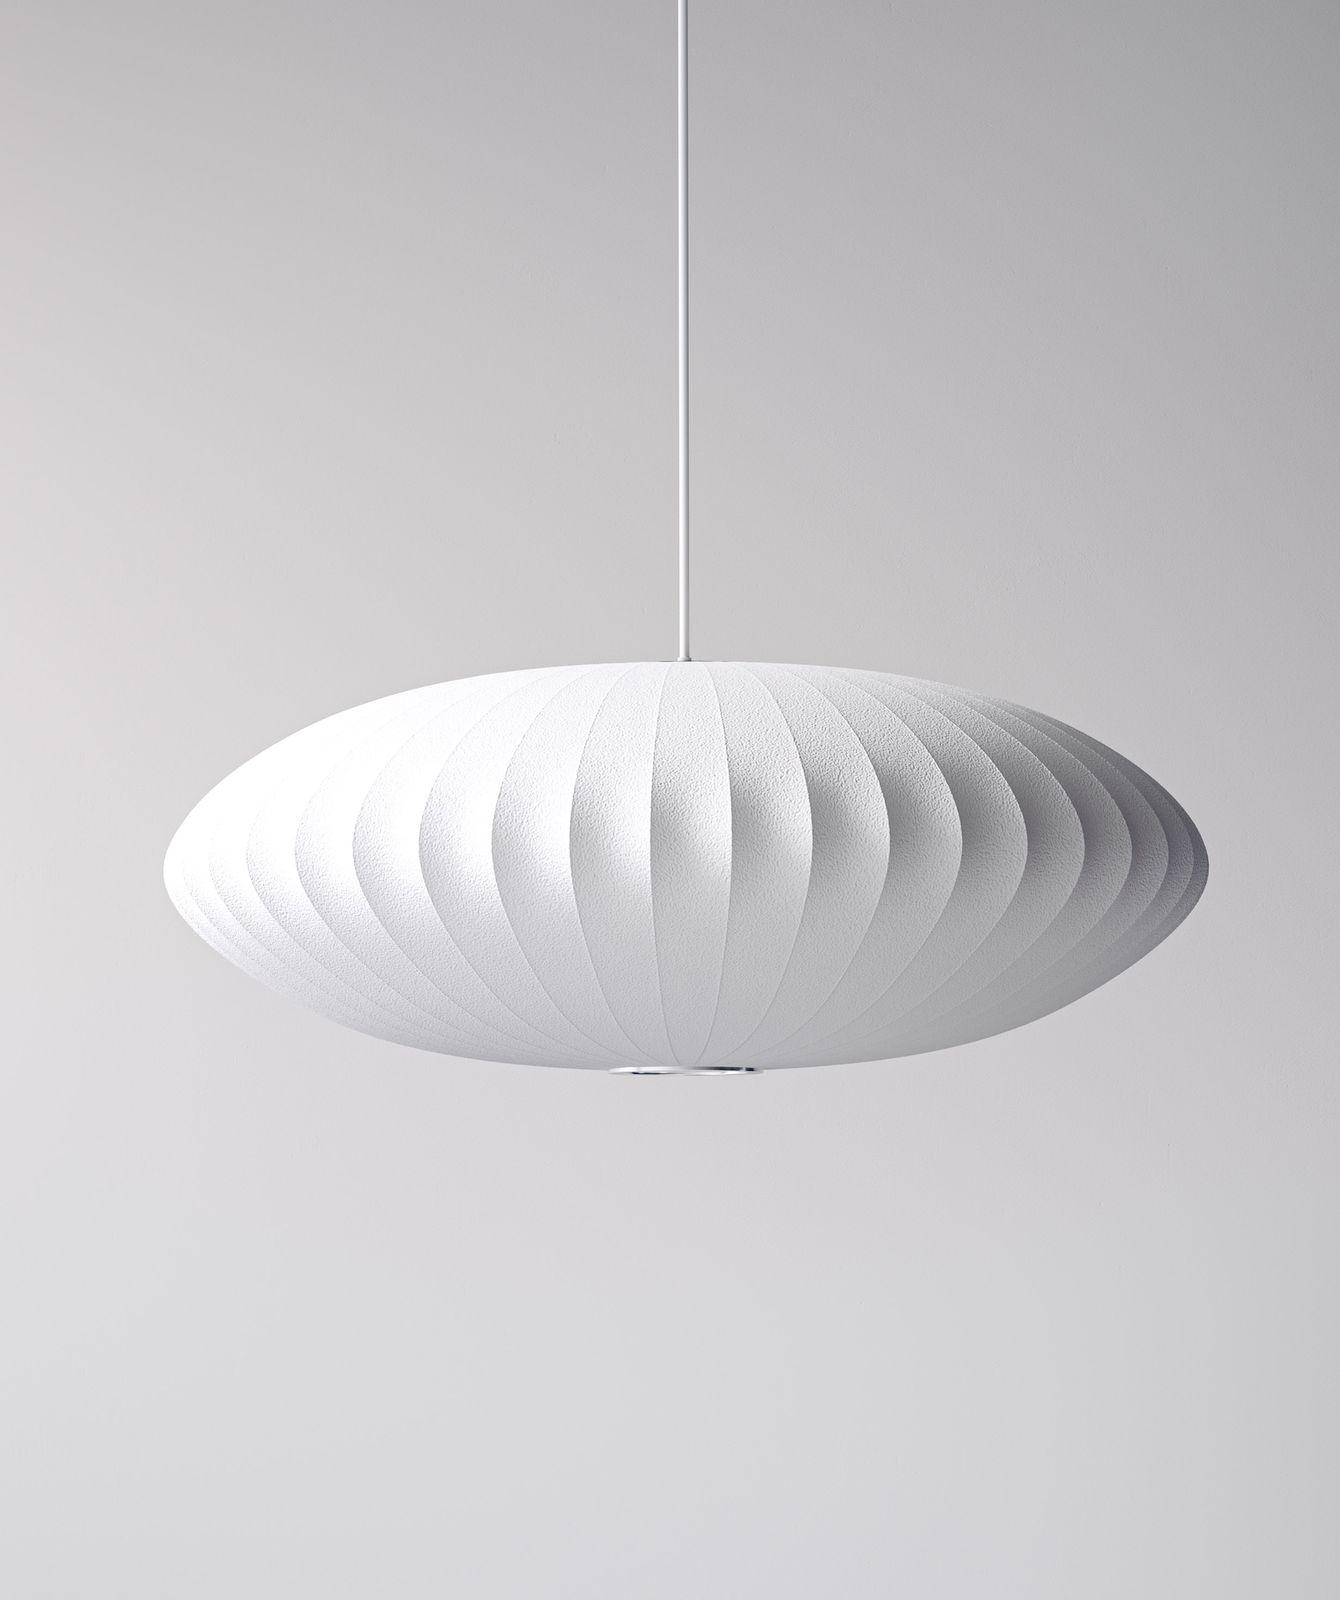 Beautiful pedant lamp in minimal setting